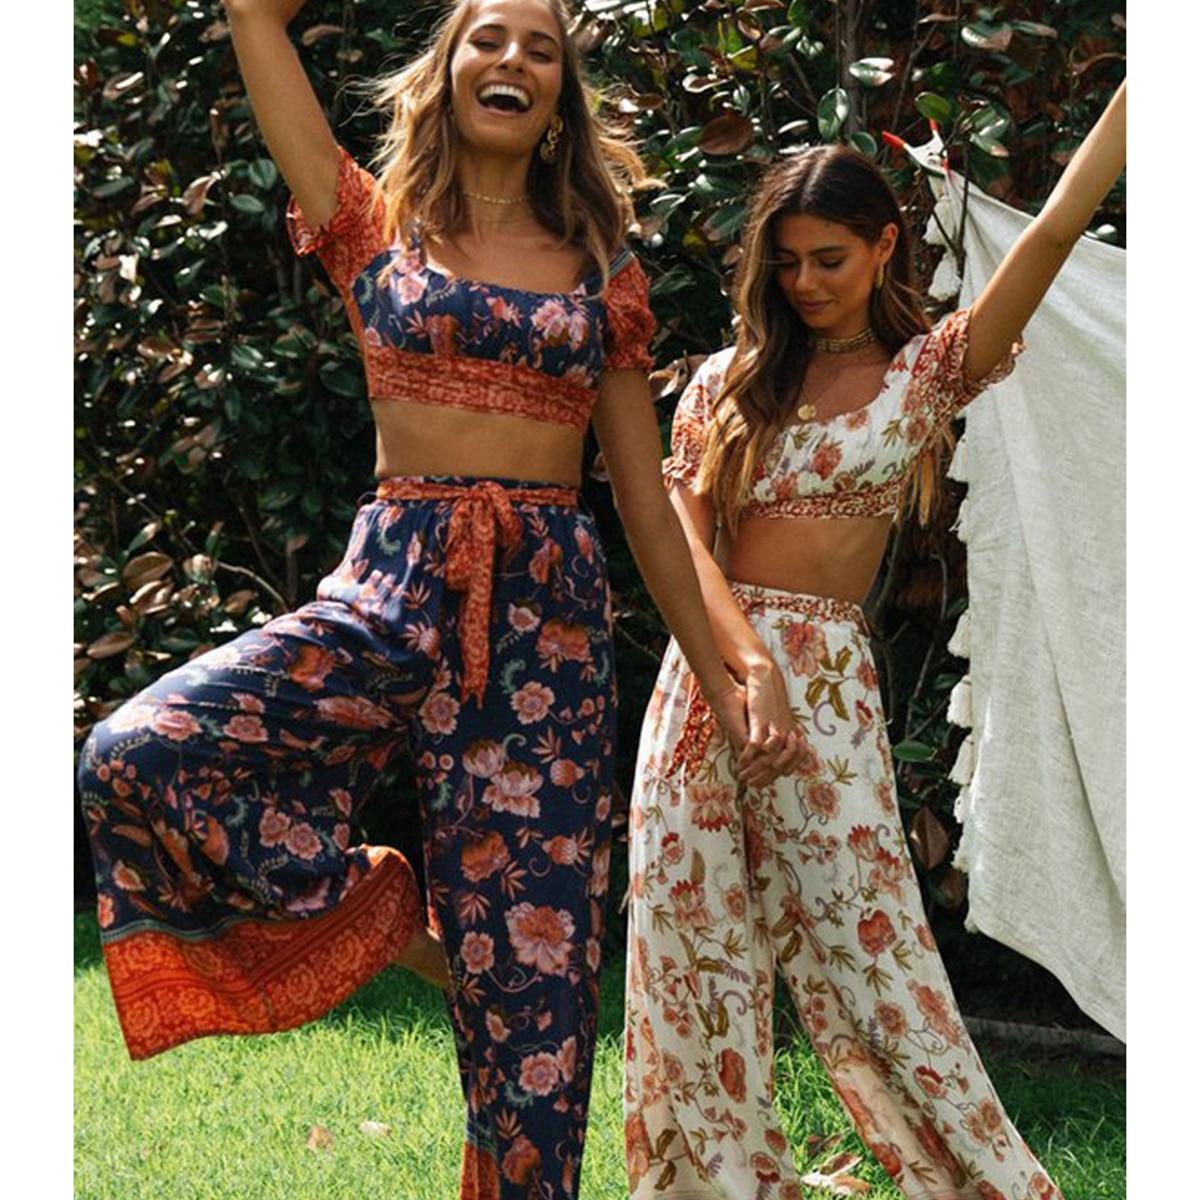 Sexy Floral Printed Blusas 2 Piece Set Vintage Puff Sleeve Short Tops Elastic Maxi Pant Summer Beach Boho Casual 2020 Women Sets